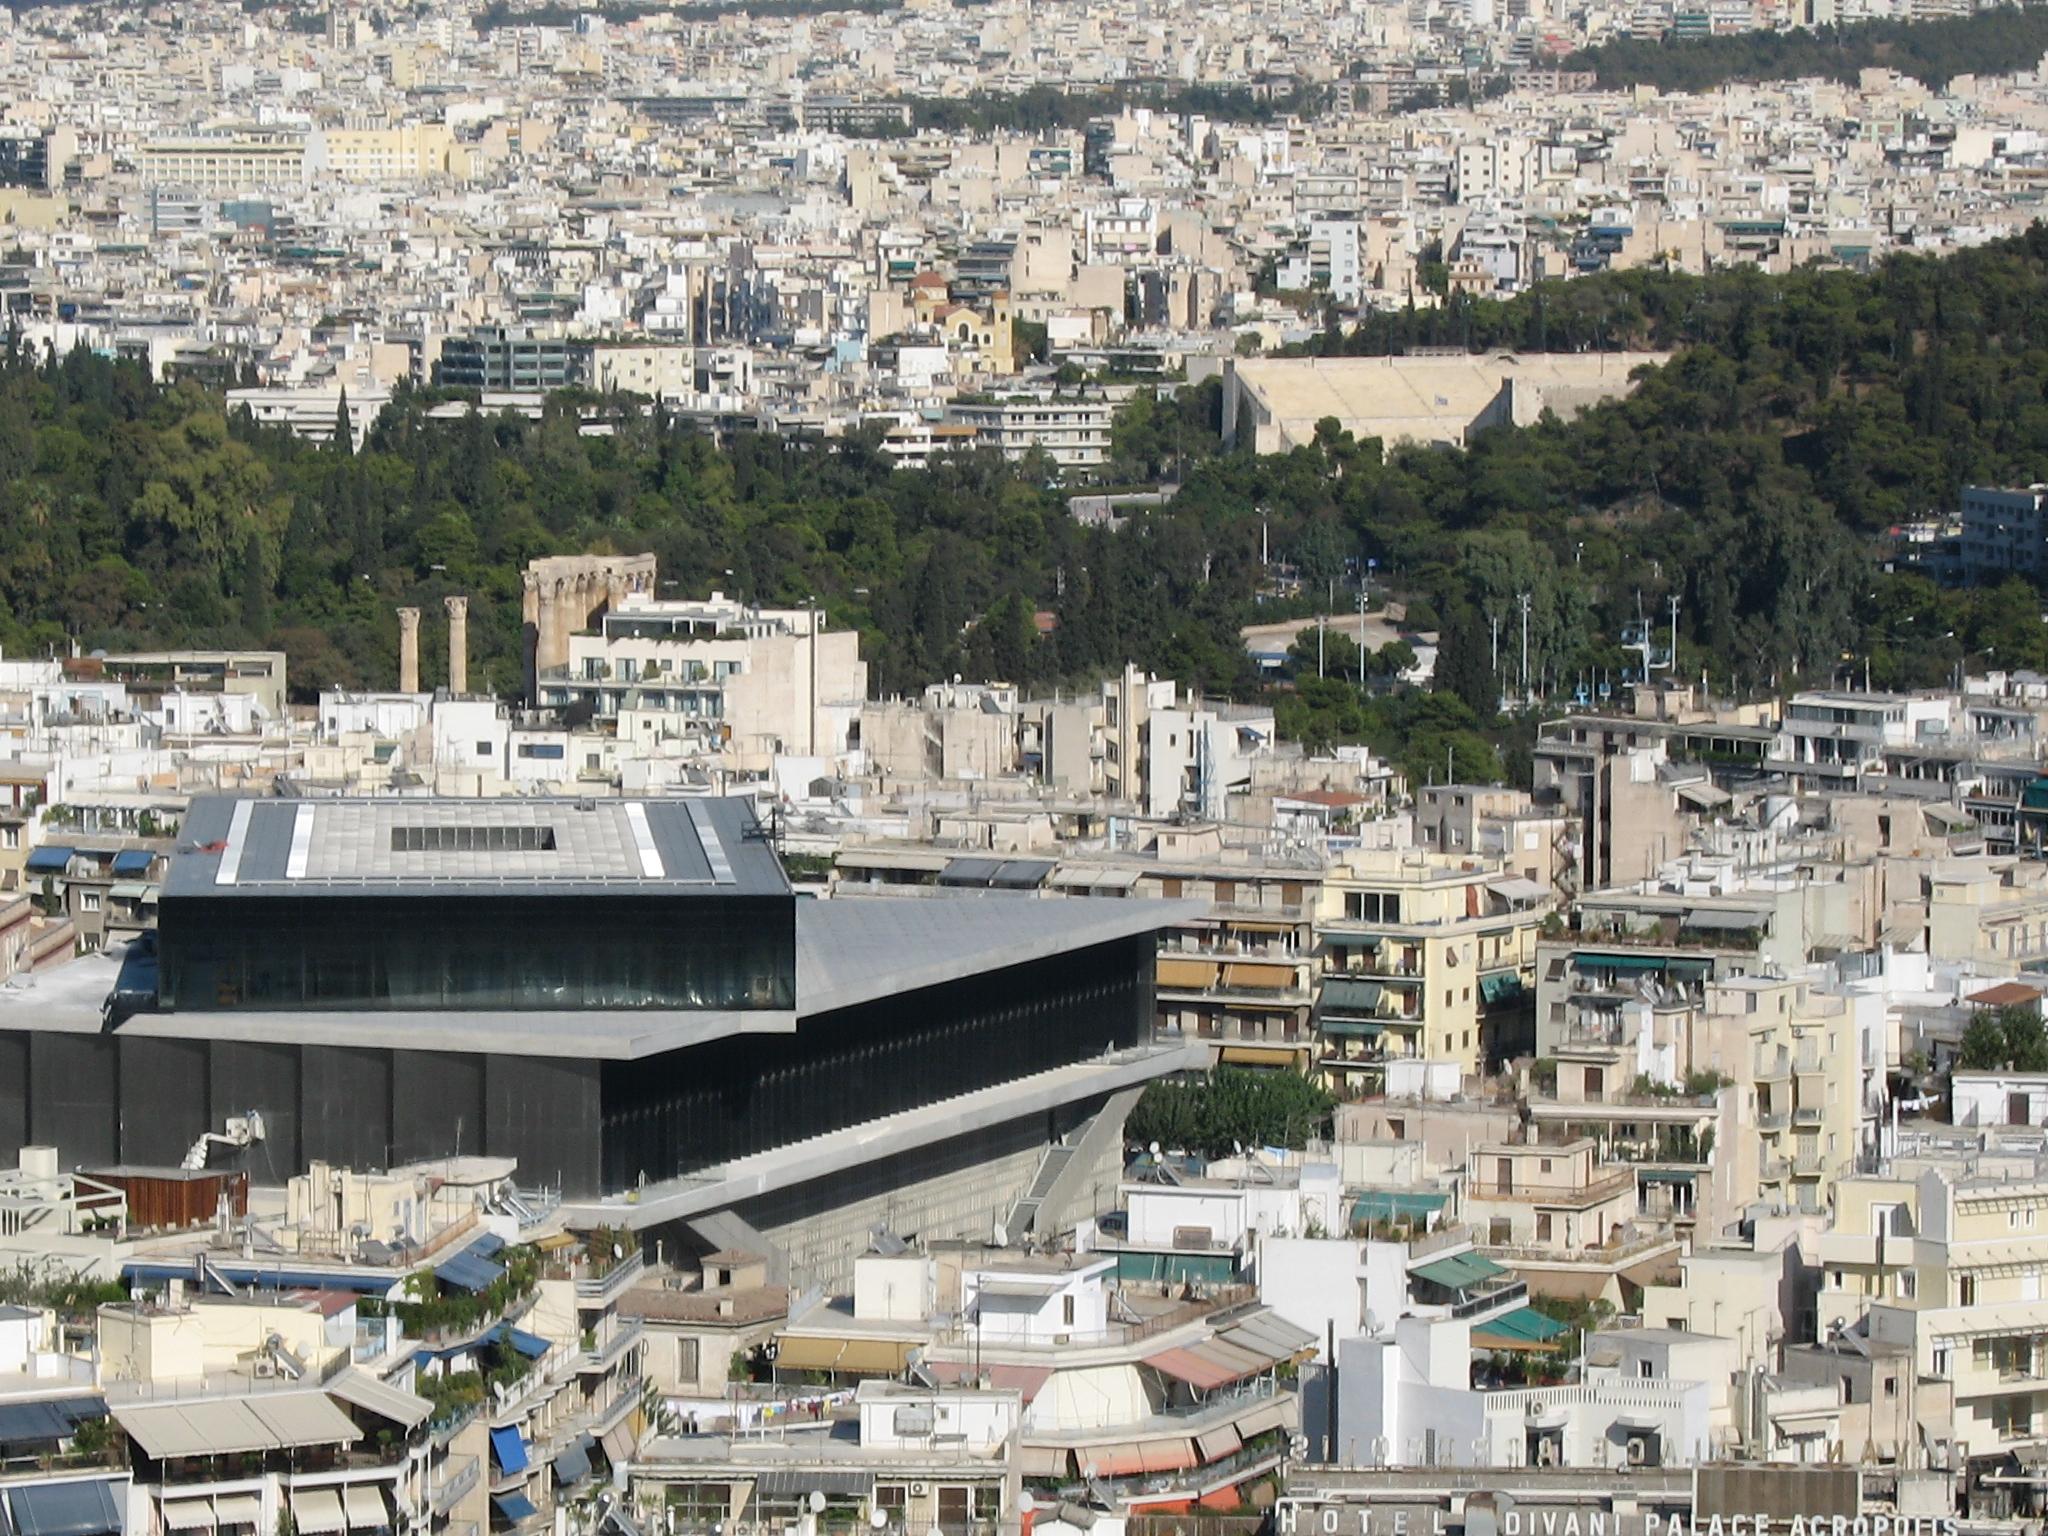 2007 Athens; new acropolis museum